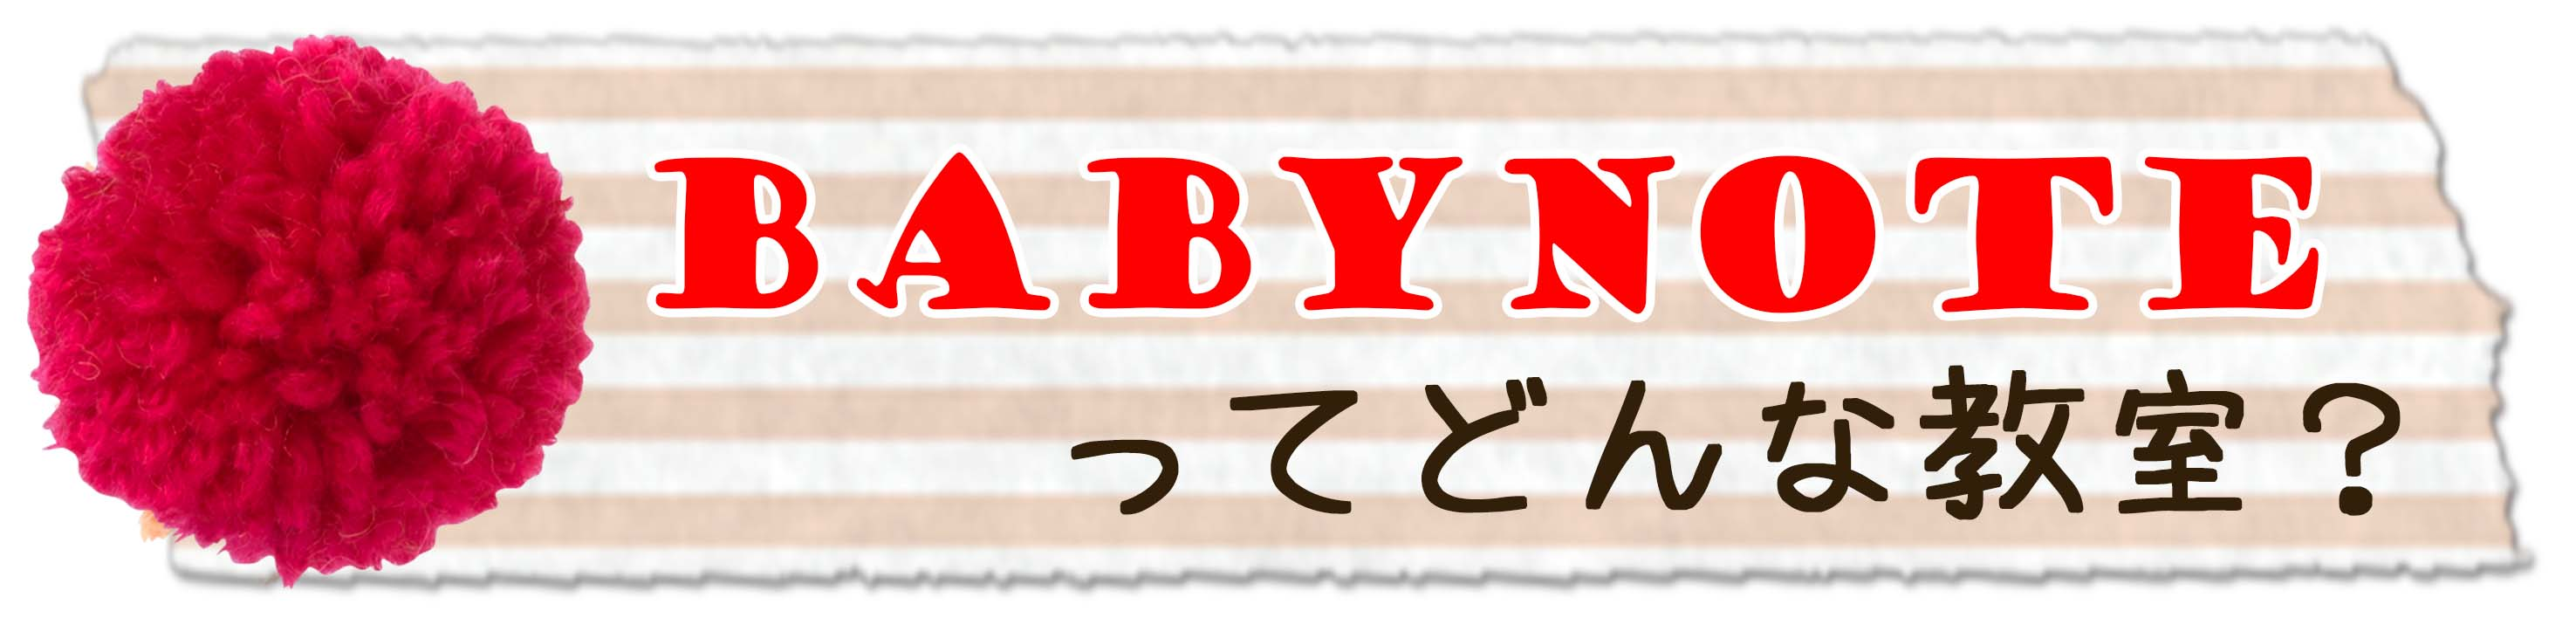 BABYNOTEバナー